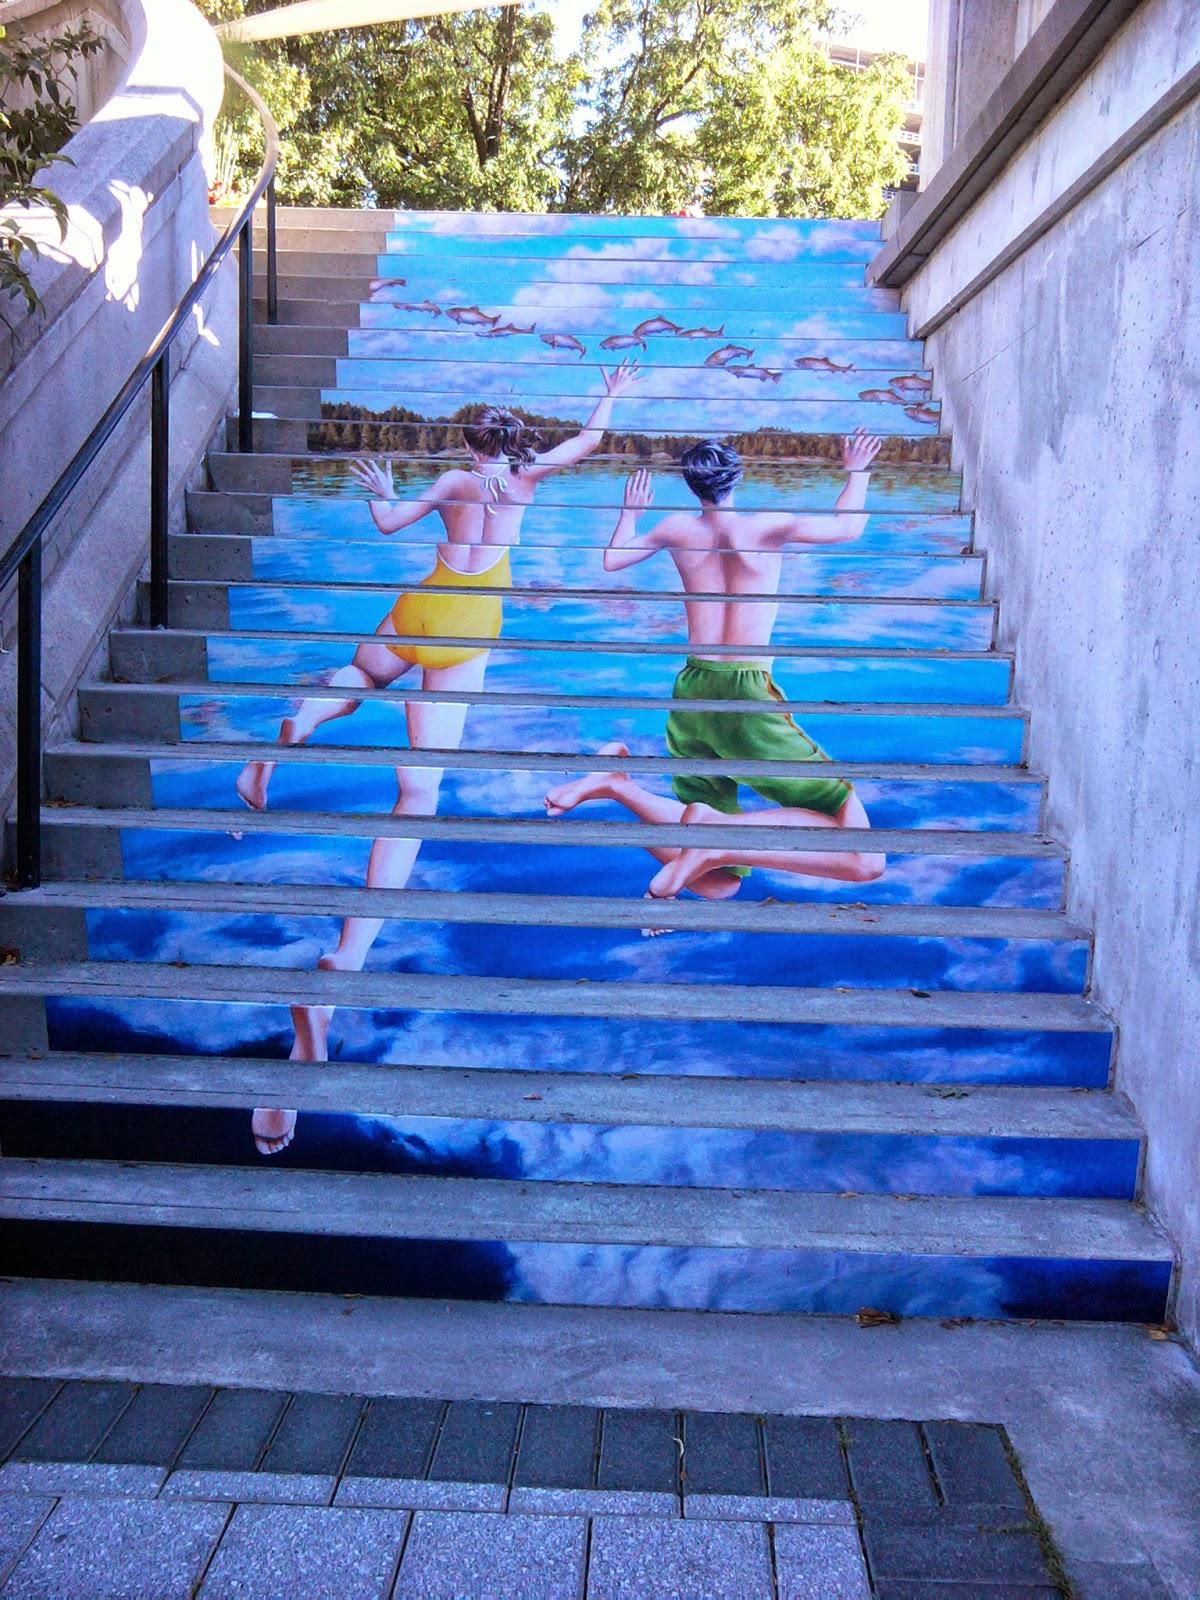 http://mocochocodotcom.files.wordpress.com/2014/04/artistic-stairs-ottawa-canada.jpg